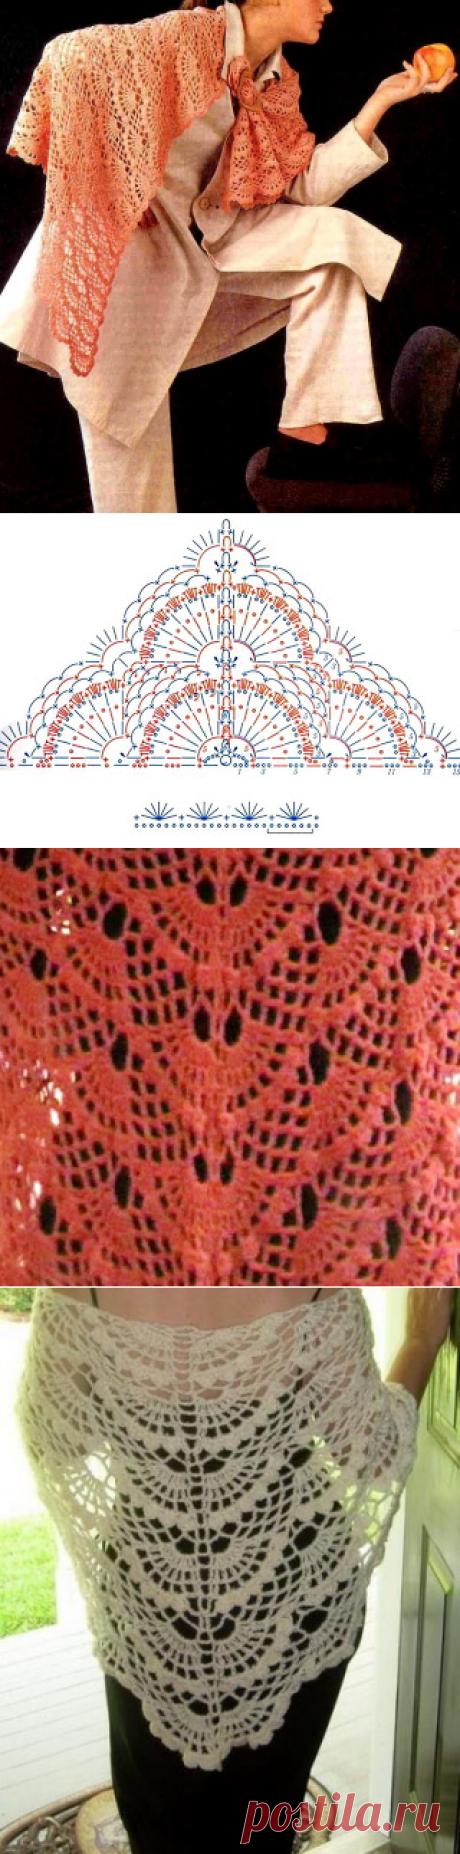 Crochet Shawls: Crochet Lace Shawl Pattern - Wonderful Women's Shawl